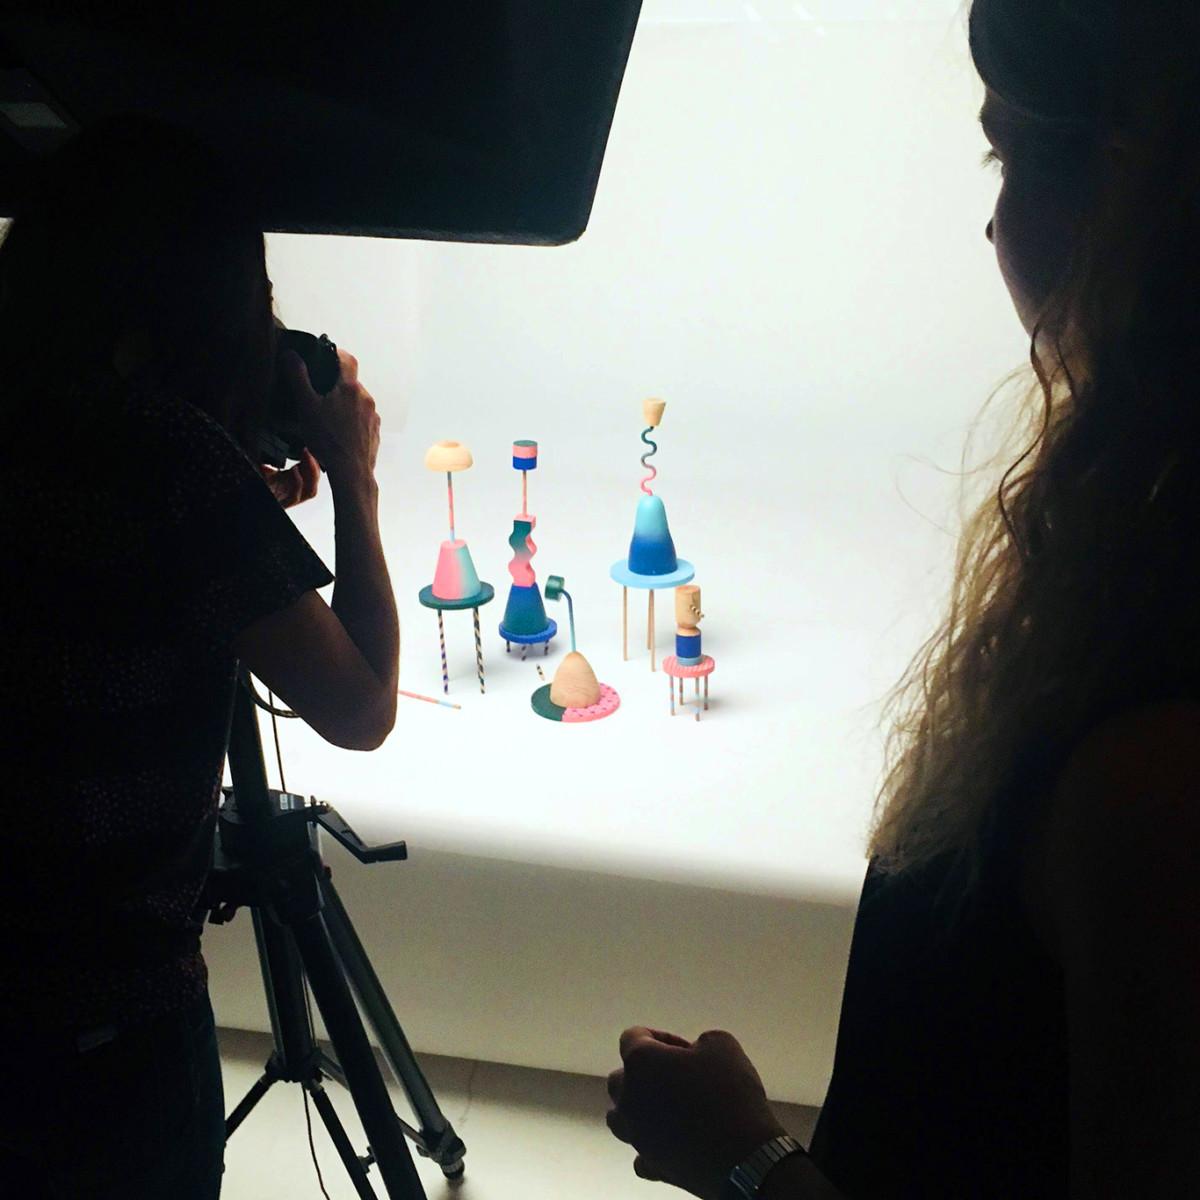 Design Luminy Shooting-18 Shooting Work in progress  shooting Servane Ardeois Noé Cardona Léa Francheschini Cécile Braneyre André Forestier   Design Marseille Enseignement Luminy Master Licence DNAP+Design DNA+Design DNSEP+Design Beaux-arts